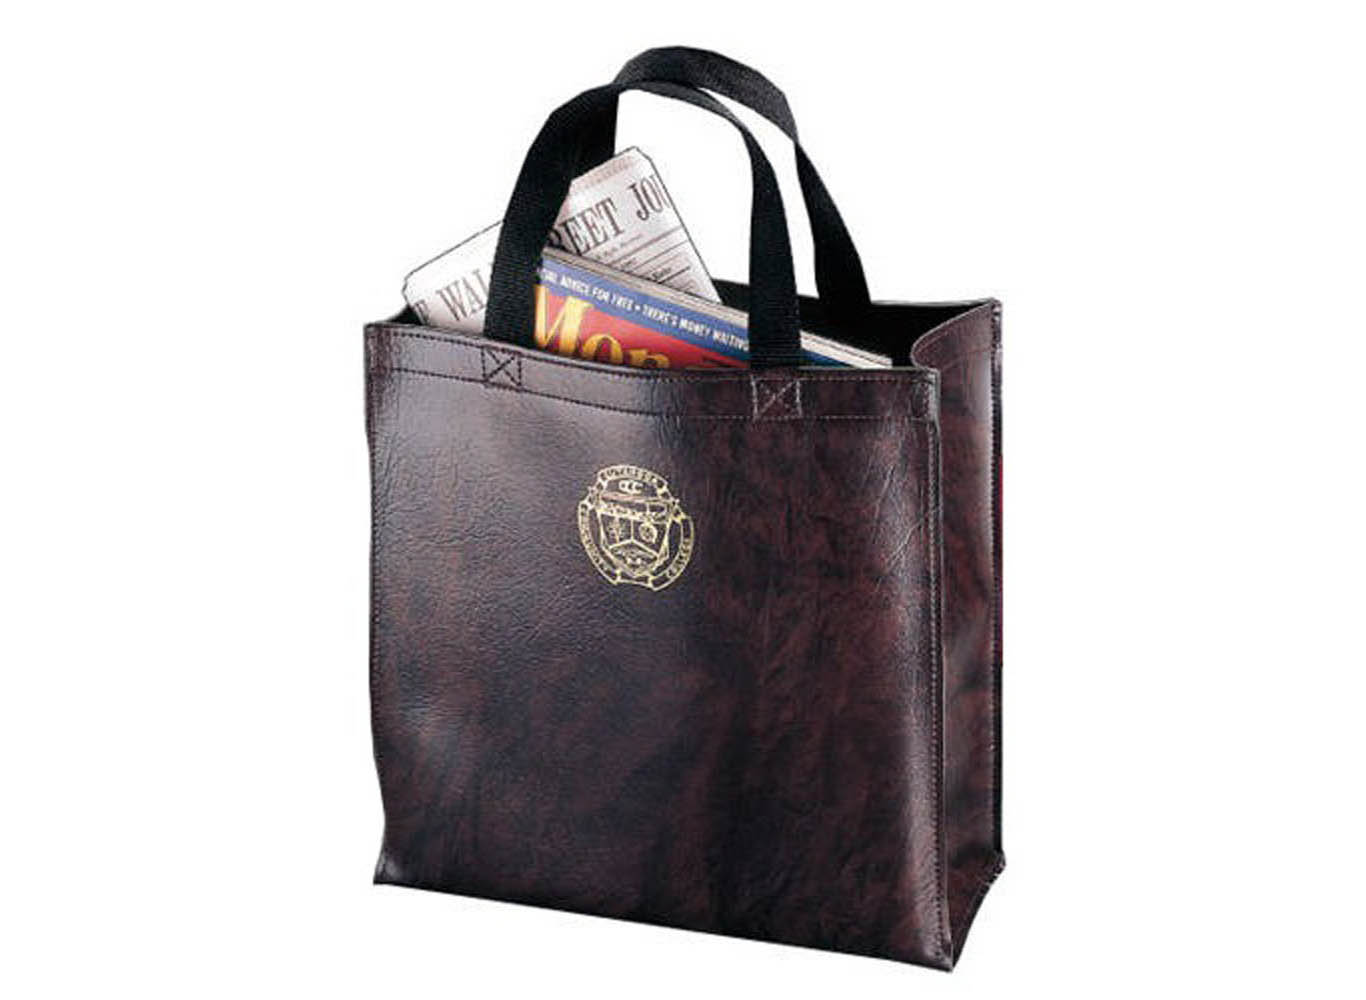 Customized Leather Executive Tote Bag